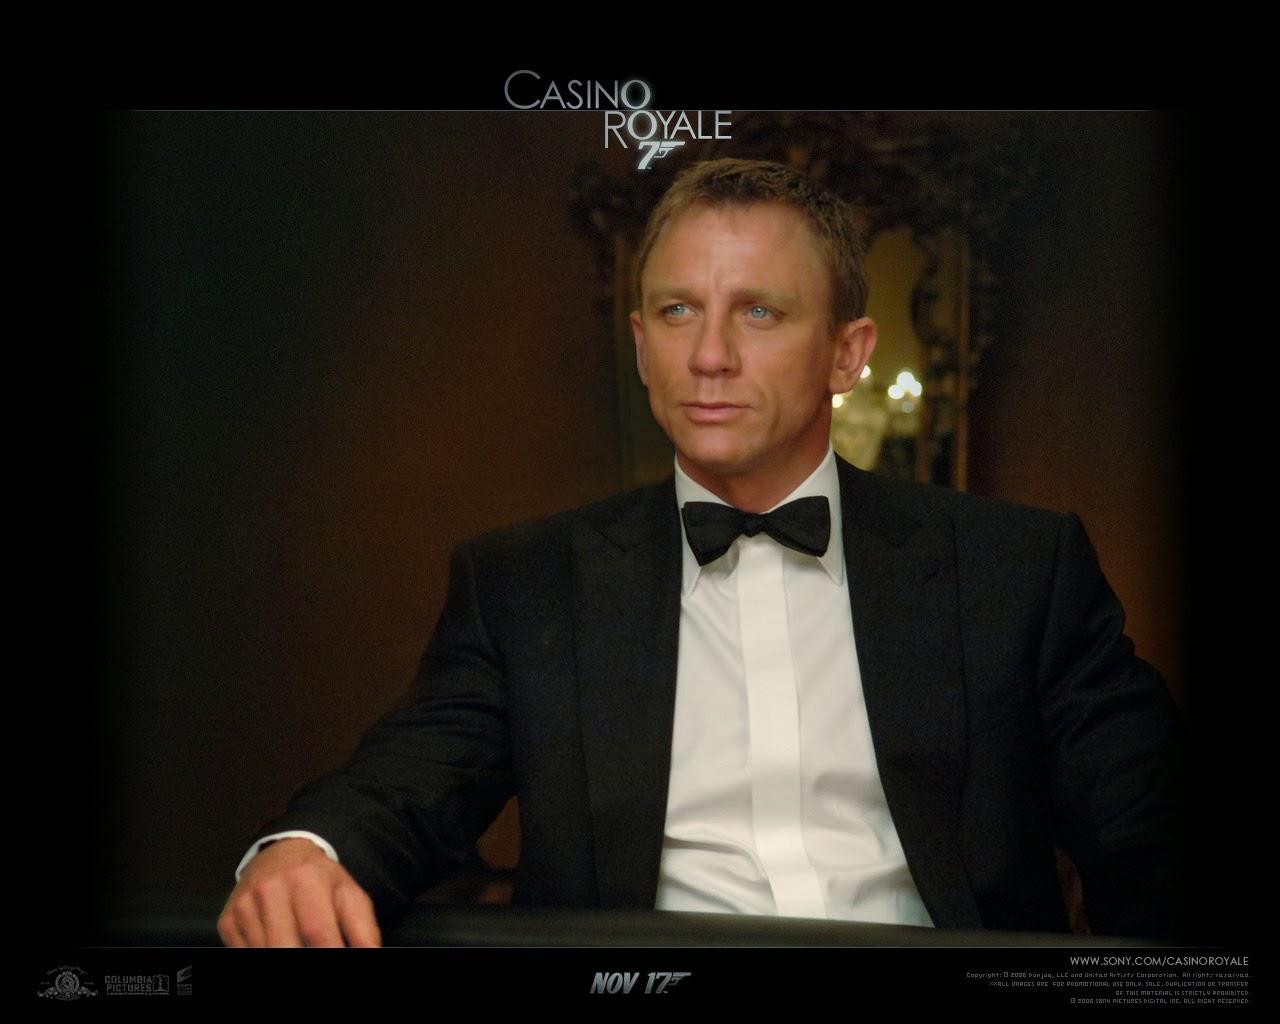 http://3.bp.blogspot.com/-zv6piqzHnag/TP53MwUK72I/AAAAAAAAA5M/EyXhgIuAe7Q/s1600/James_Bond_007_-_Casino_Royale%252C_2006%252C_Daniel_Craig.jpg